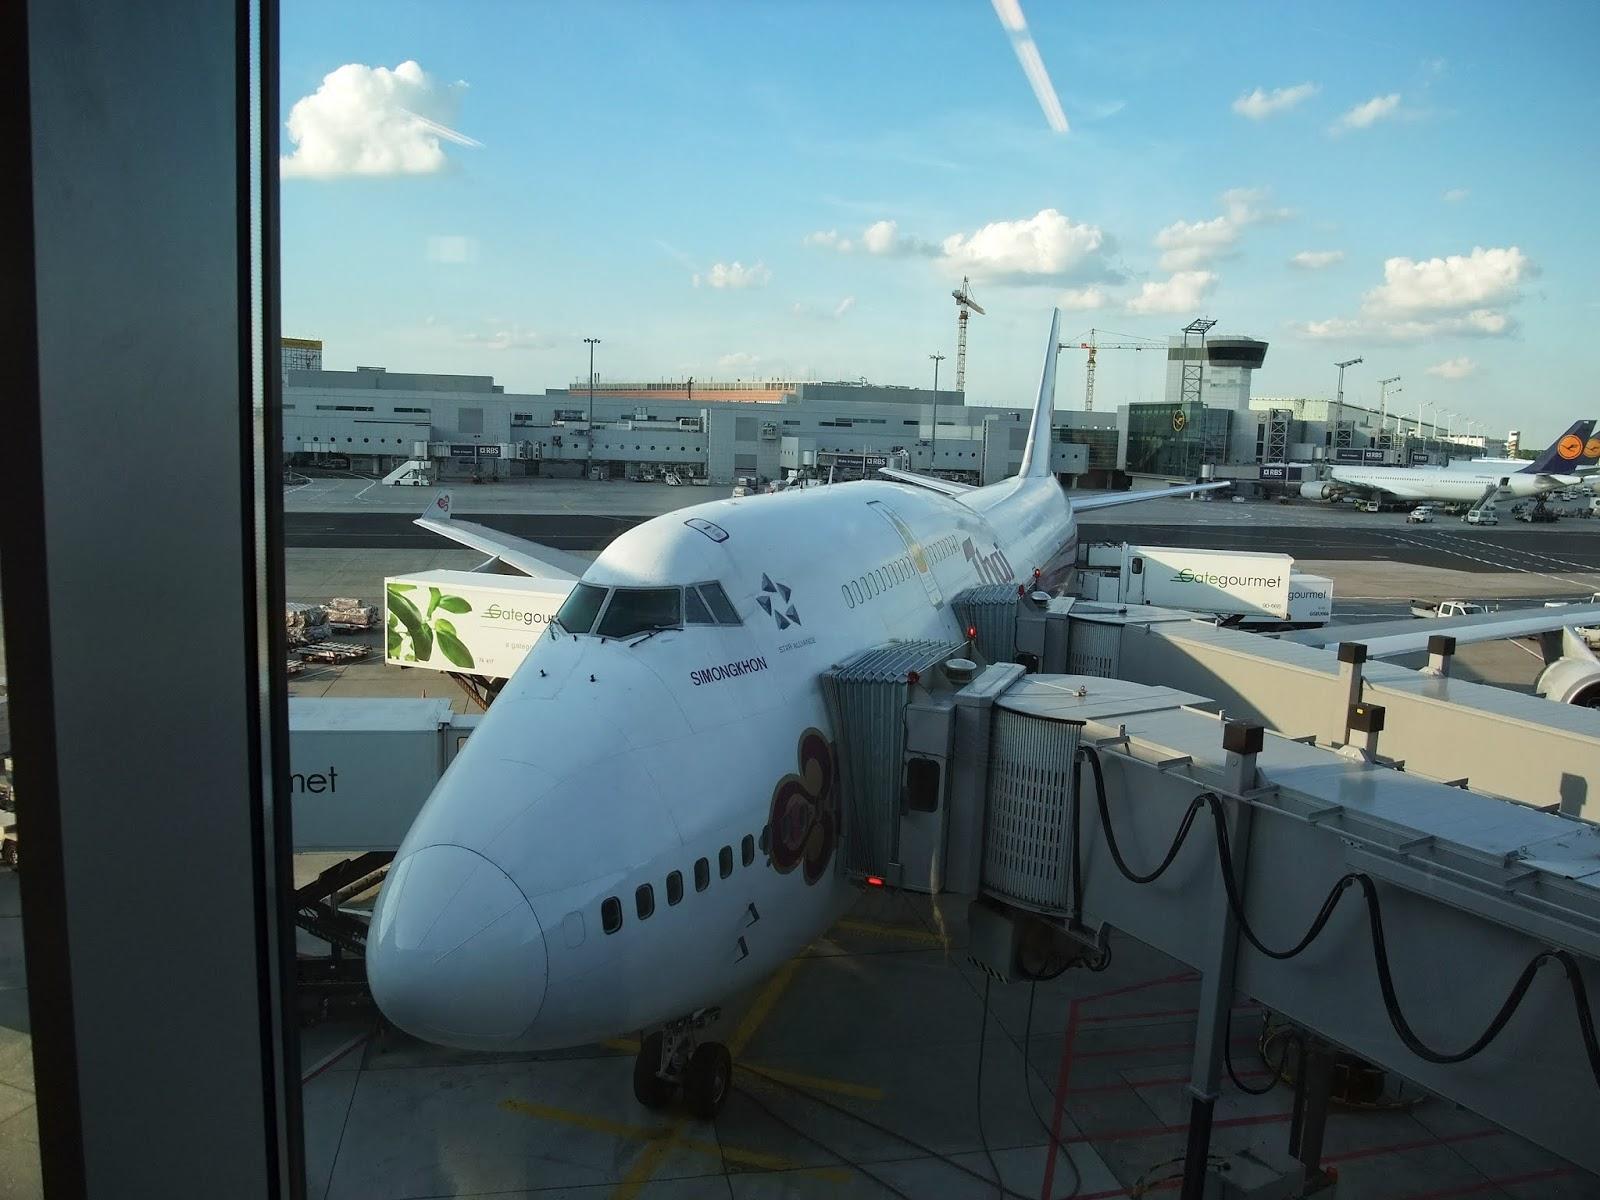 德國 - 法蘭克福機場 (Frankfurt airport. FRA)